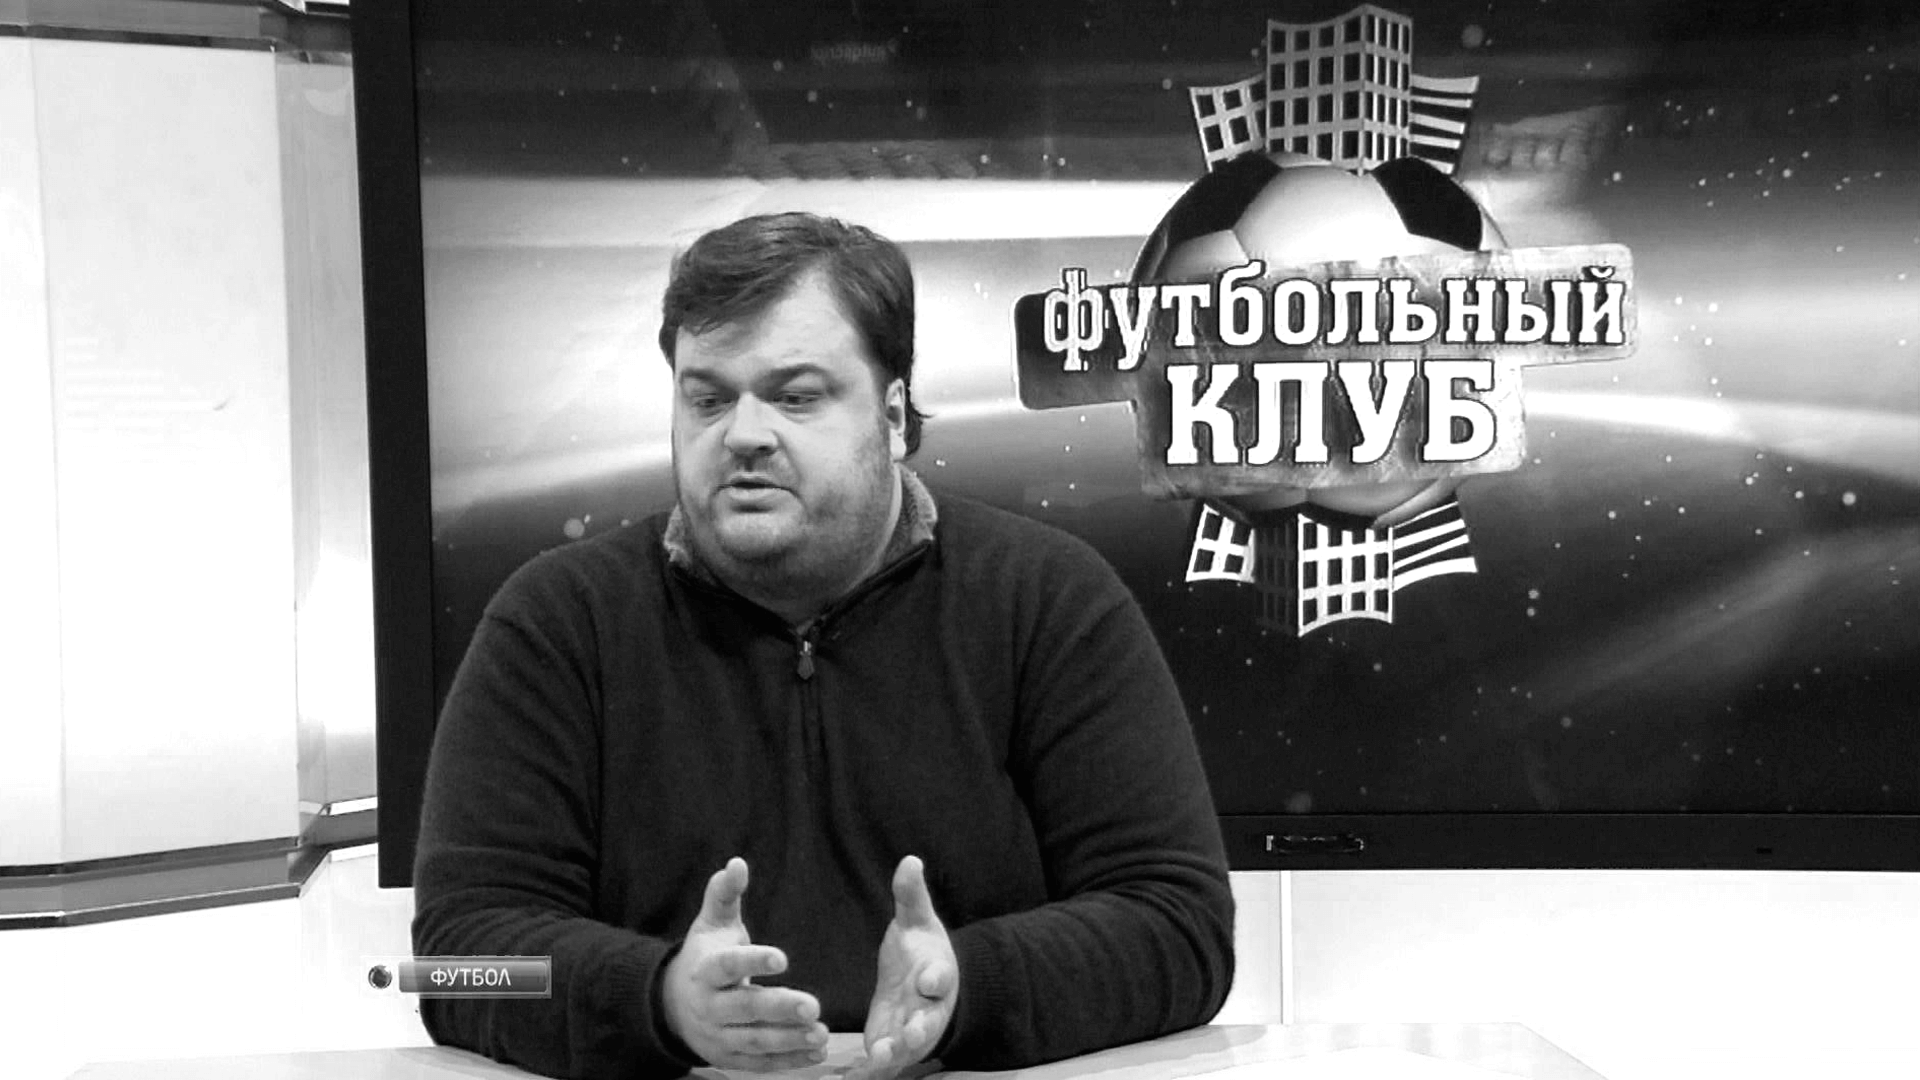 brodude.ru_17.09.2015_TKbPxGKjC0Dzu